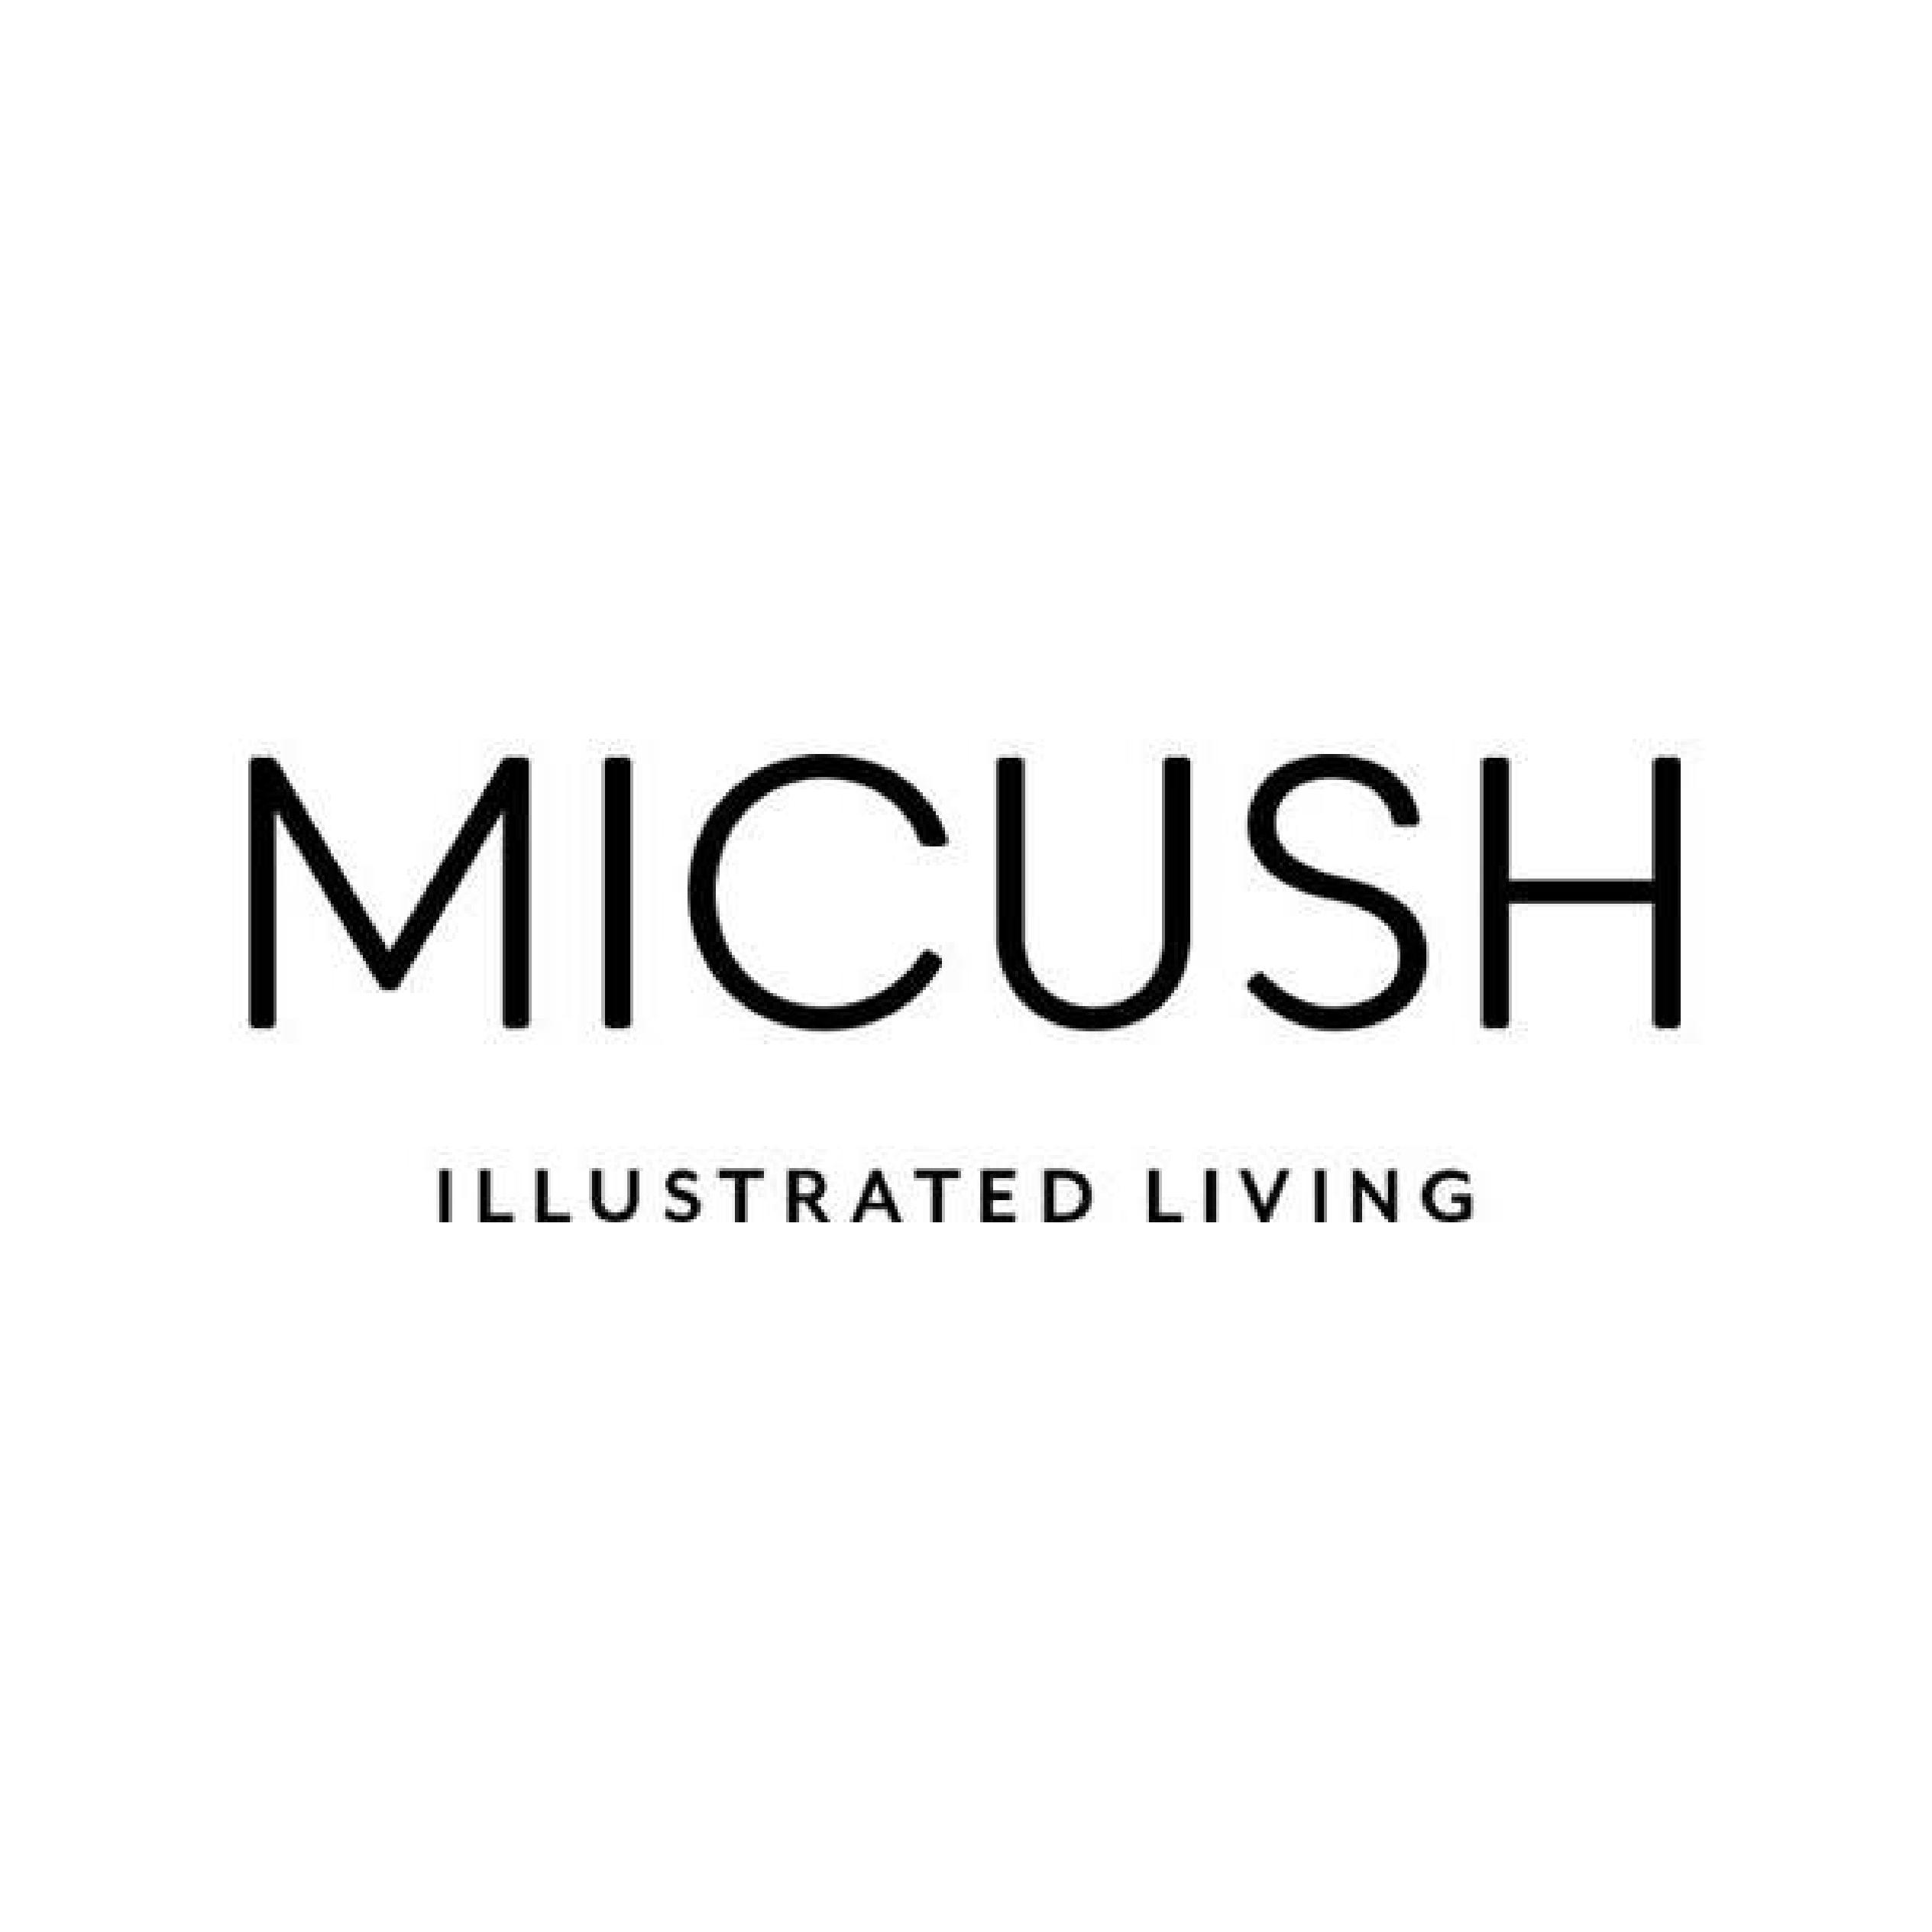 micush (1)